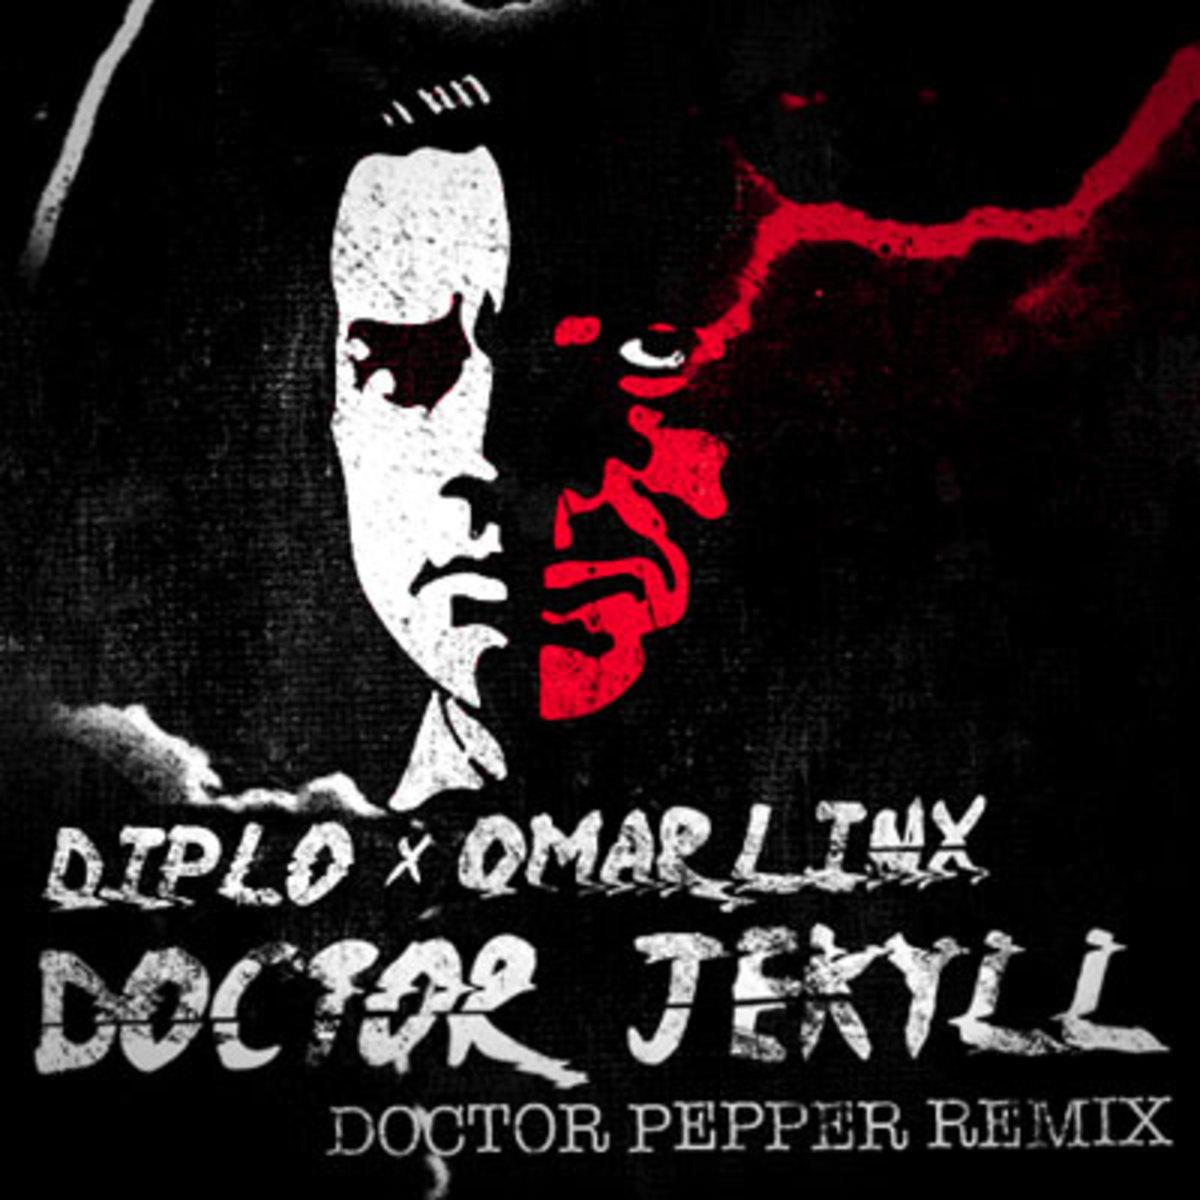 omar-linx-doctor-jekyll.jpg